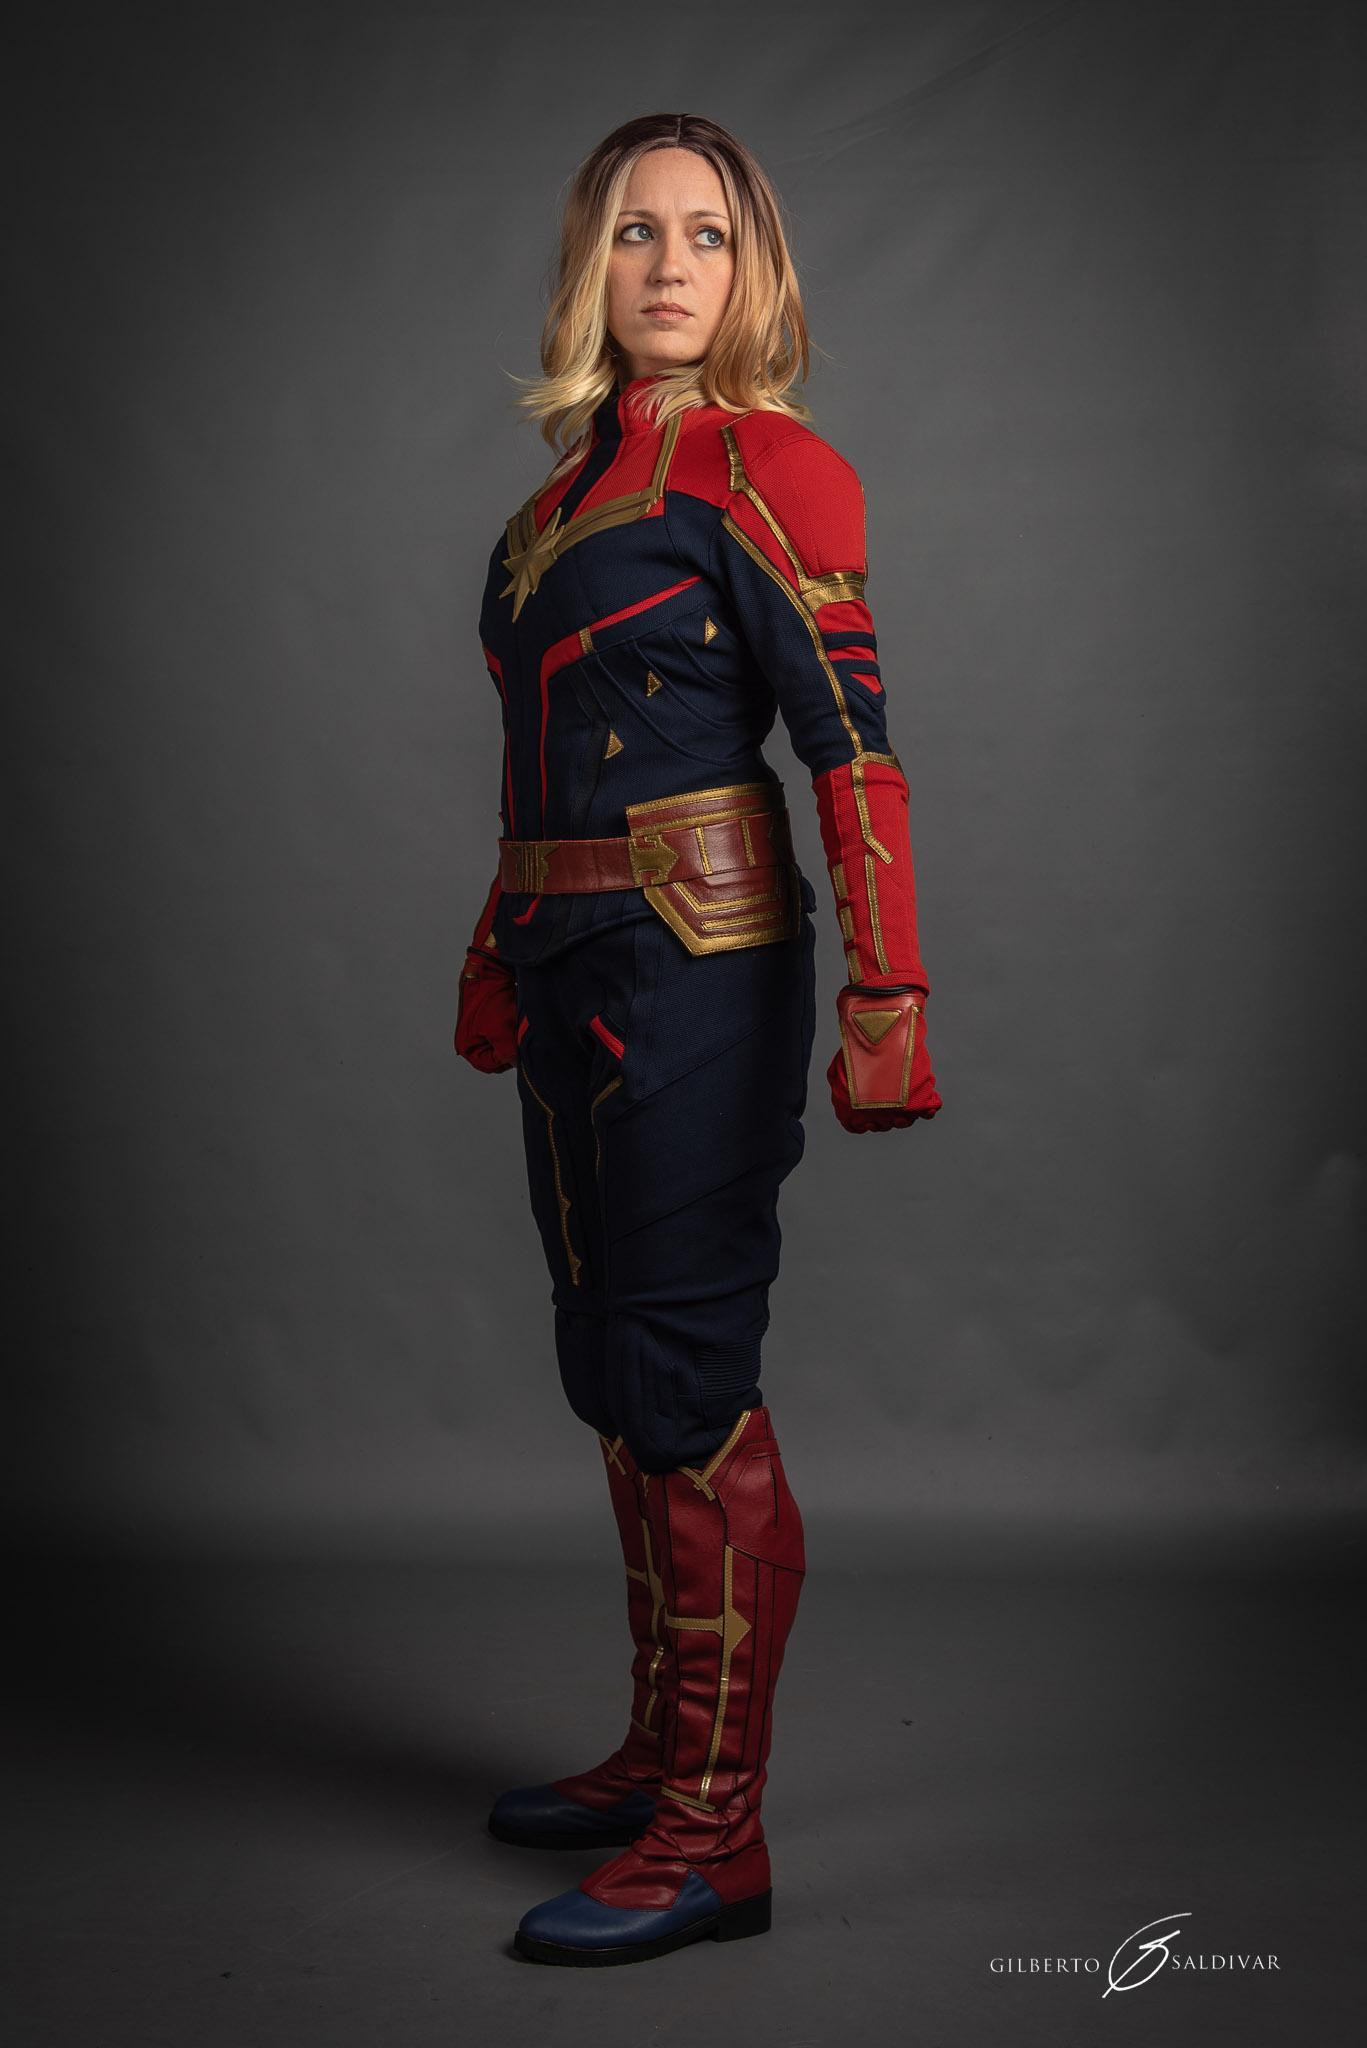 Carol Danvers Captain Marvel movie costume suit Product Code : WS-2404